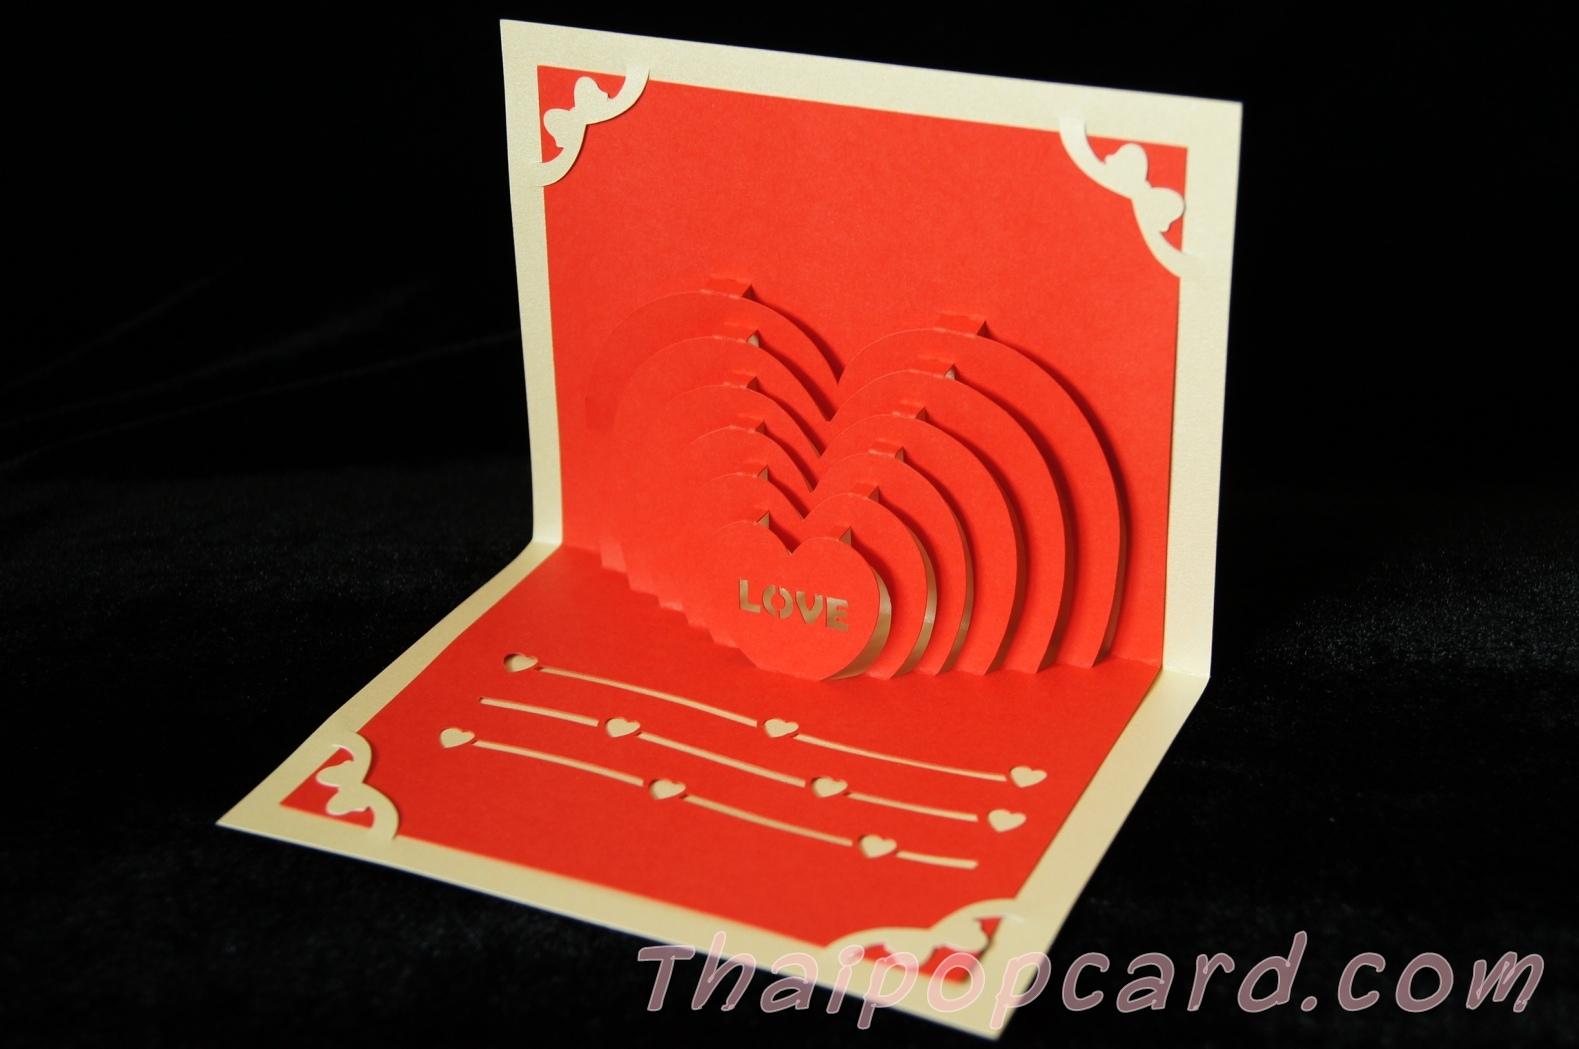 A14 การ์ดป๊อปอัพไดคัทหัวใจแดงครีมมุก